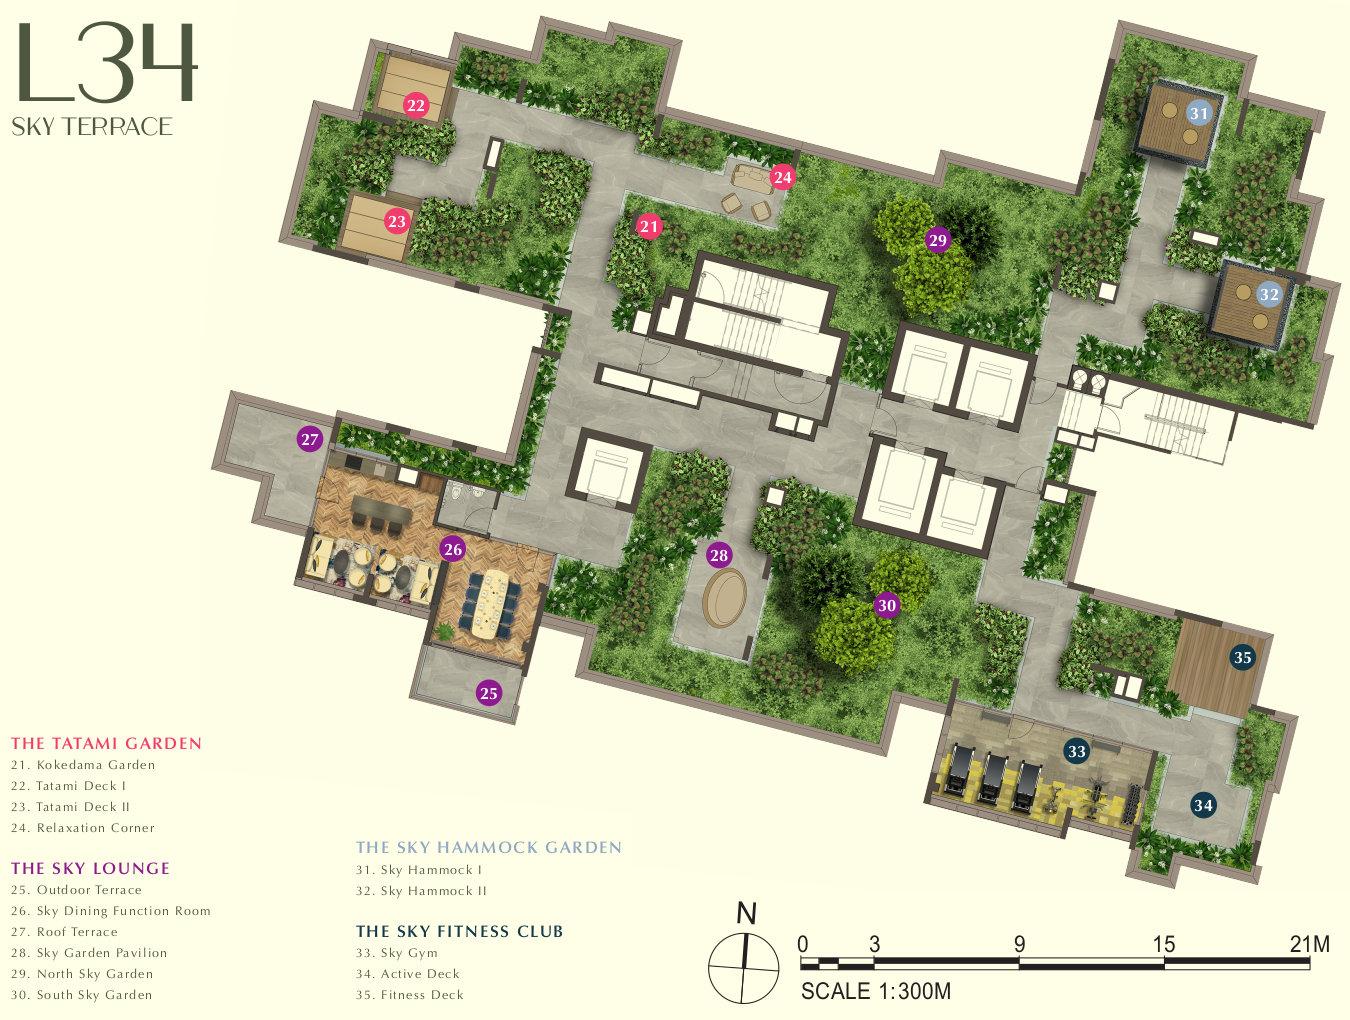 One Bernam Condo Site Plan . Level 34 Sky Terrace